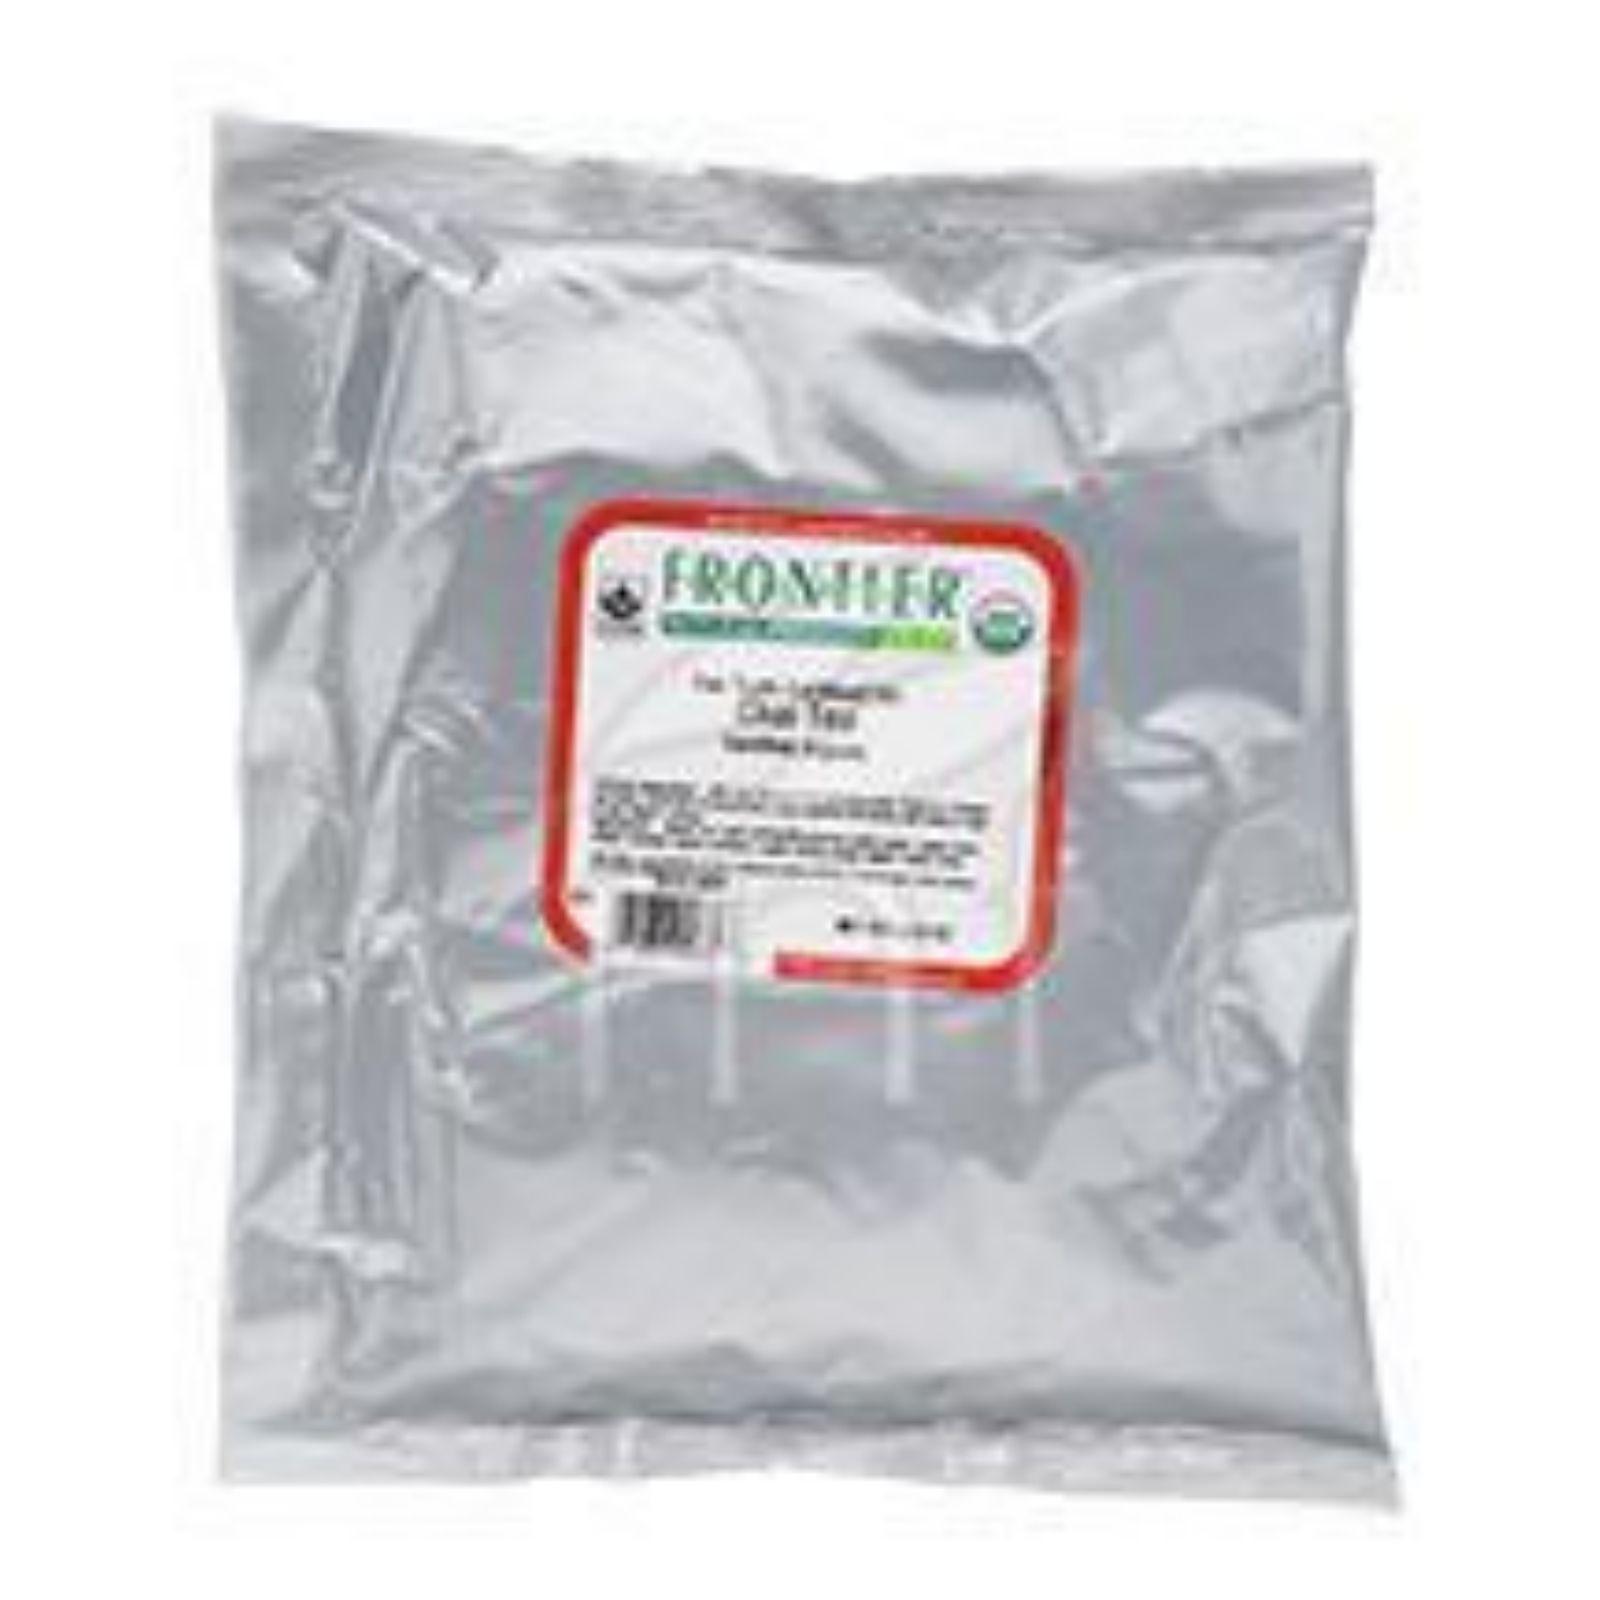 Frontier Herb Tea - Organic - Fair Trade Certified - Chai...